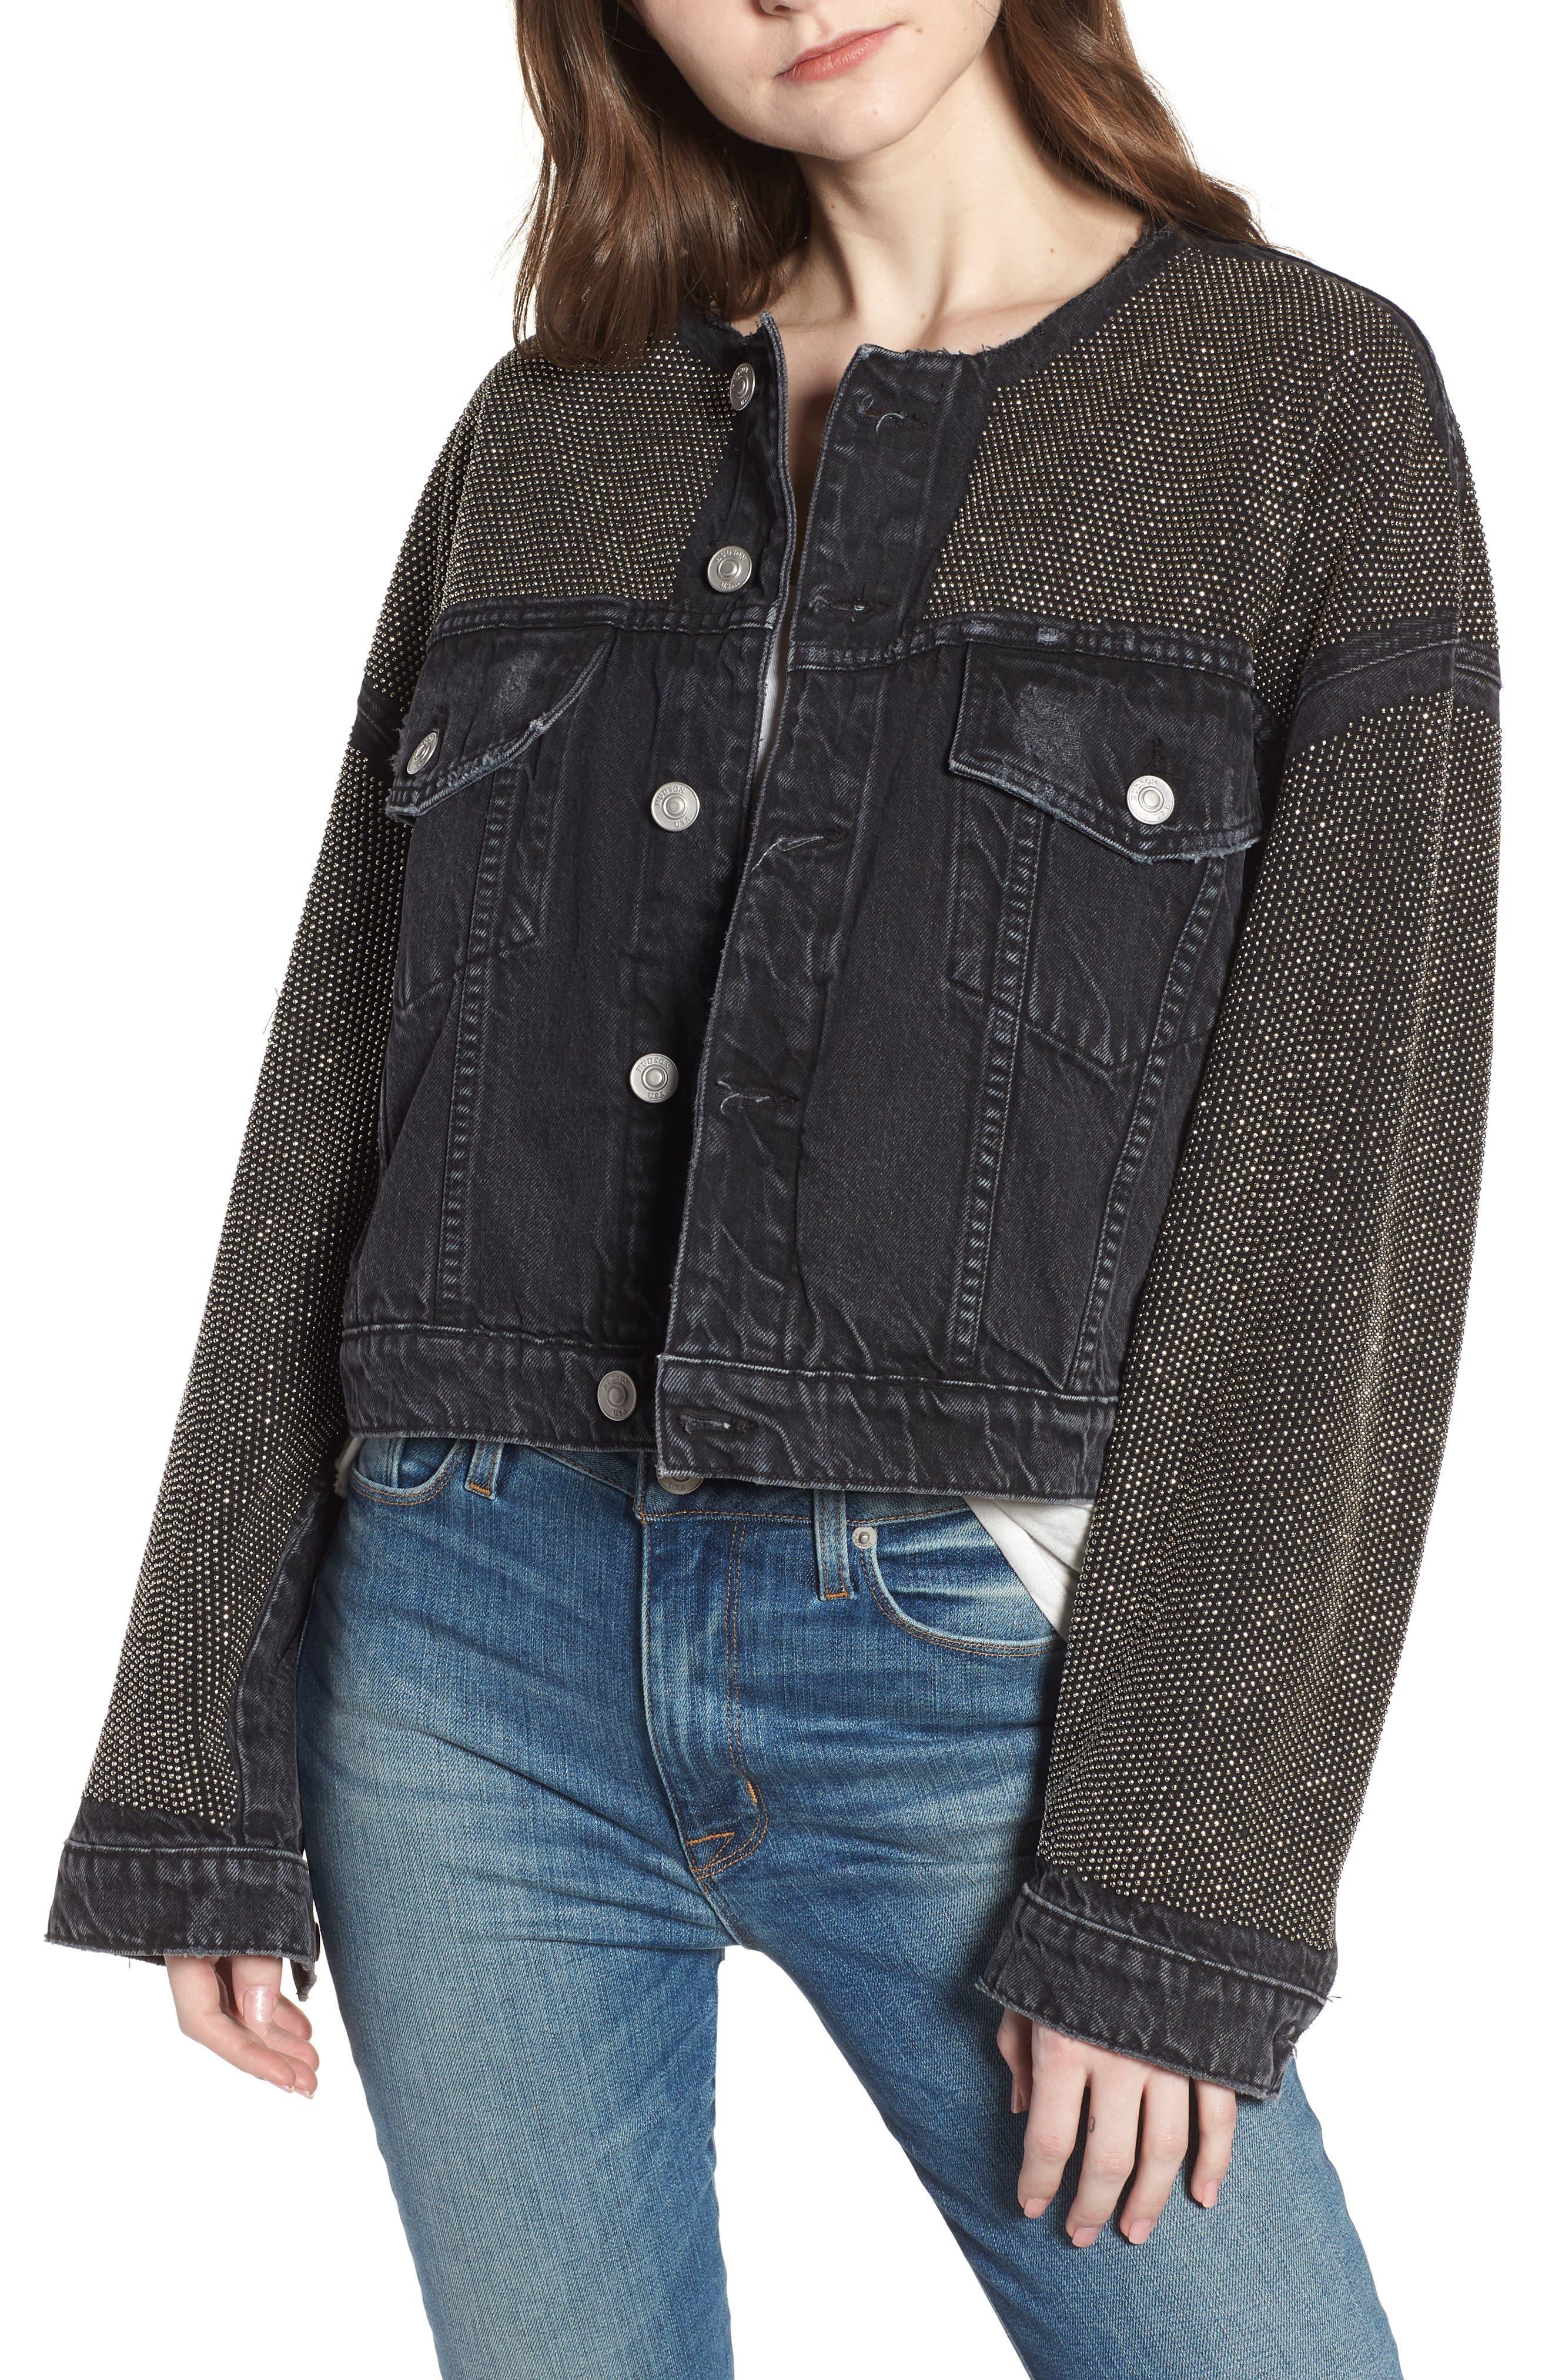 Rei Studded Crop Denim Jacket,                             Main thumbnail 1, color,                             001